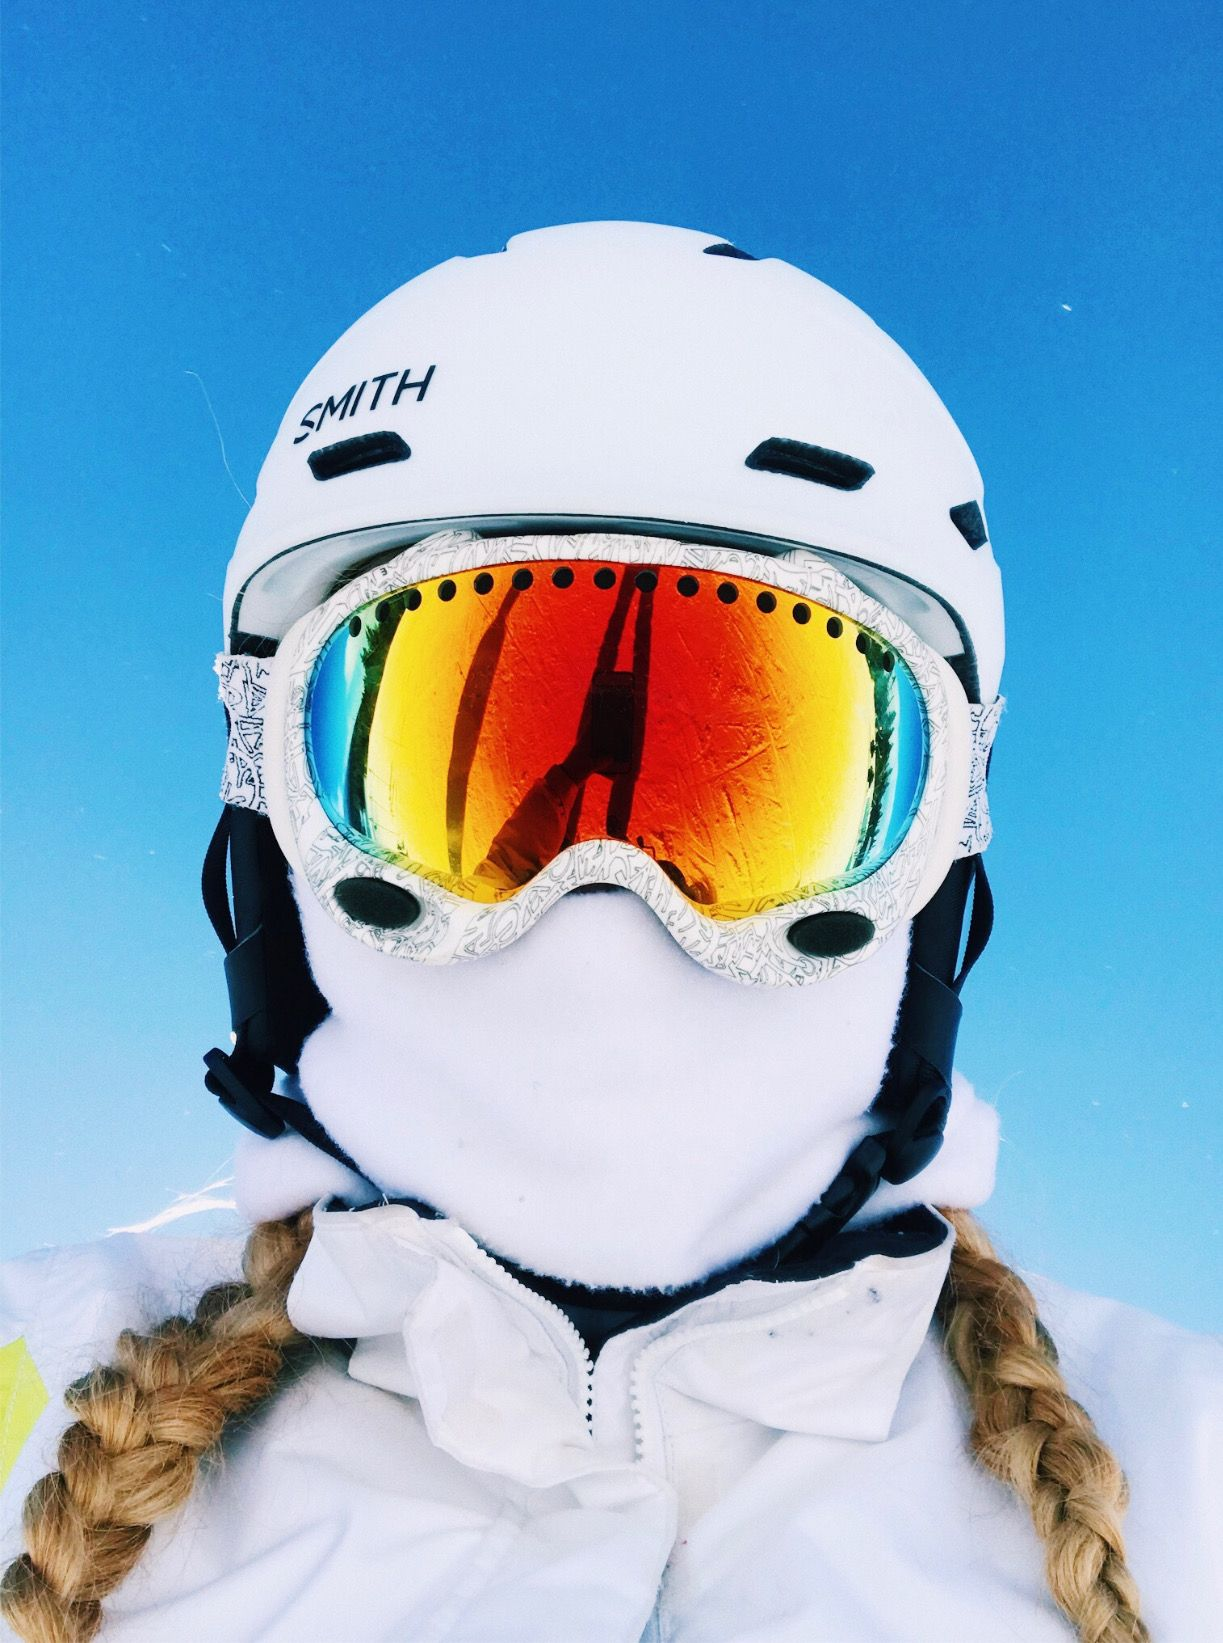 Instagram Linda Chiu Ski Pictures Skiing Skiing Outfit